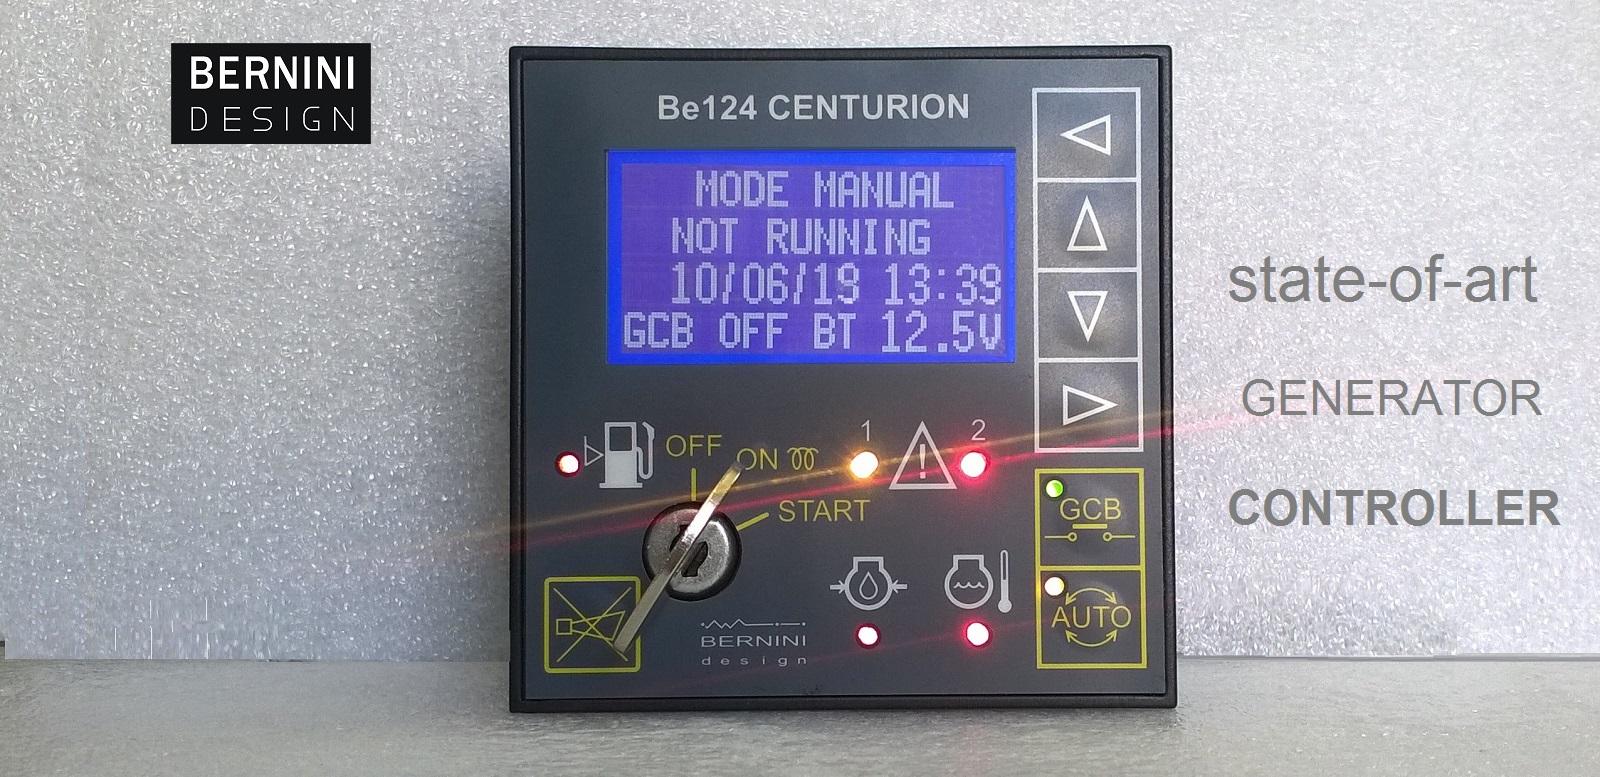 bernini design generator controller